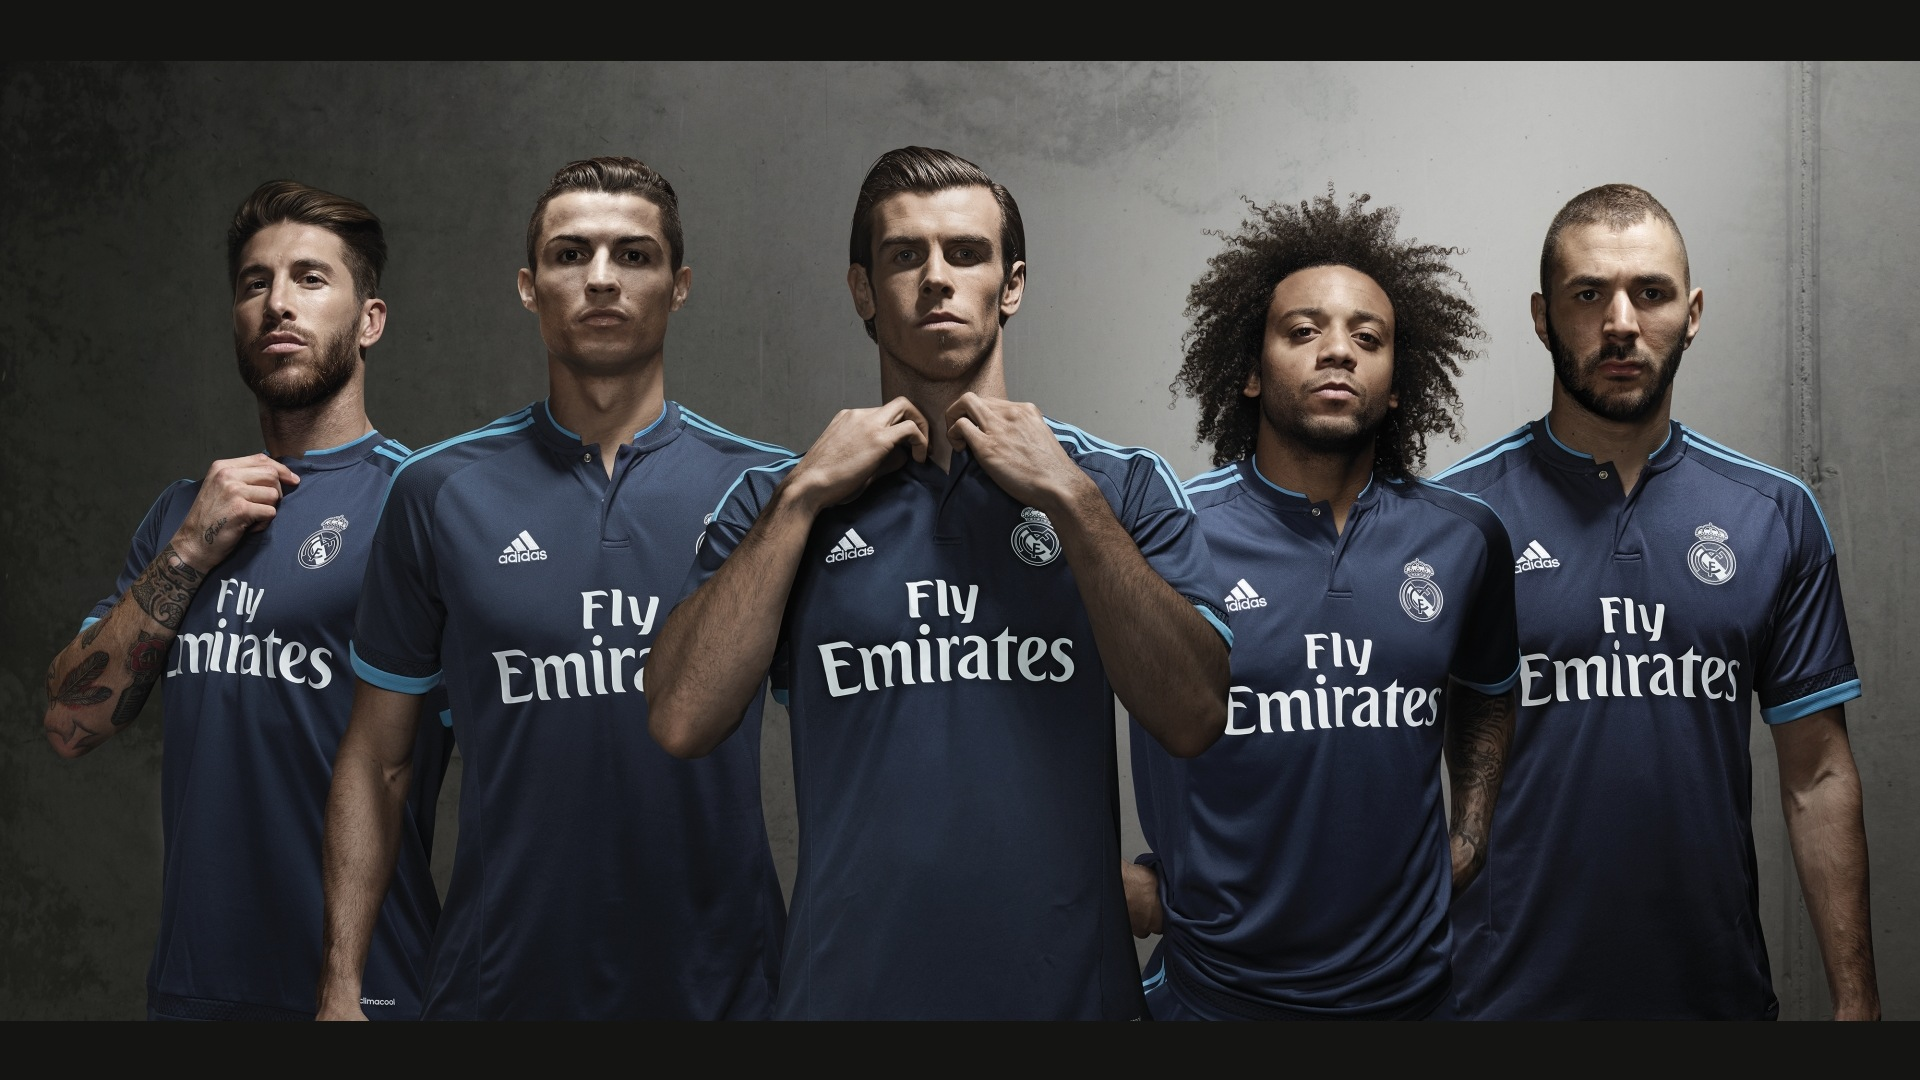 Real Madrid Wallpaper 29438 Wallpaper Download HD Wallpaper 1920x1080